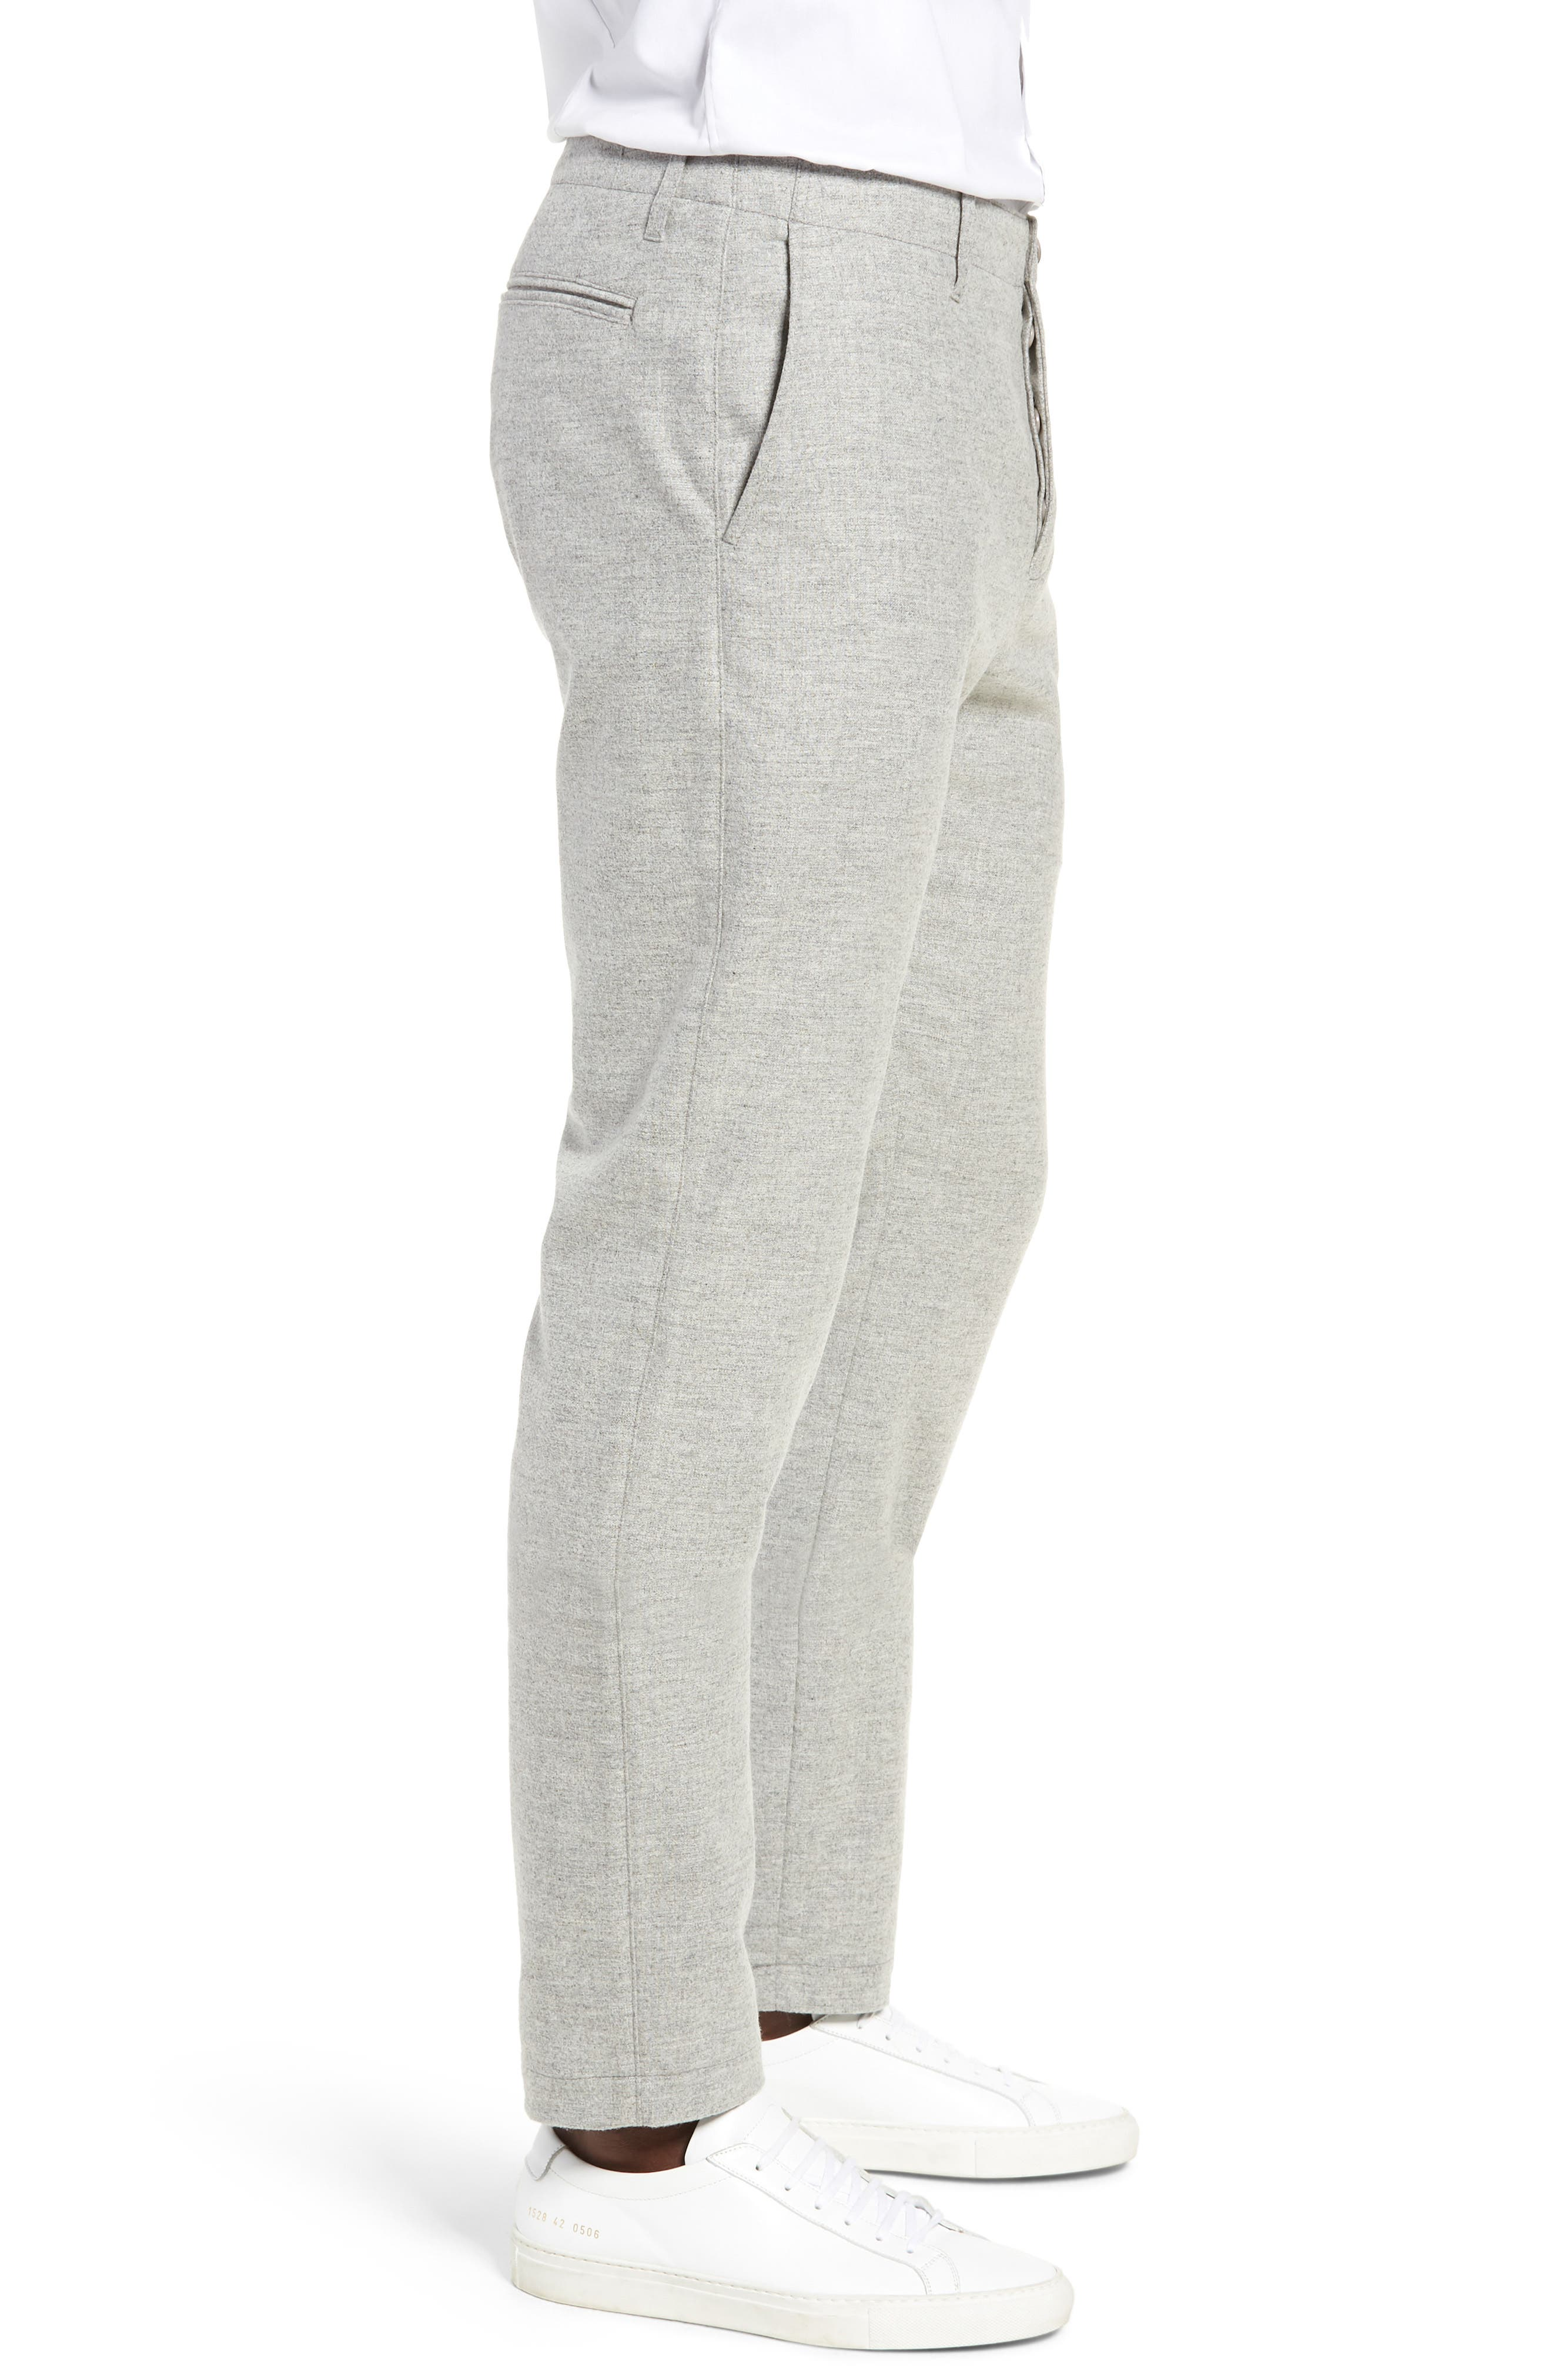 DJVU Slim Fit Trousers,                             Alternate thumbnail 3, color,                             027